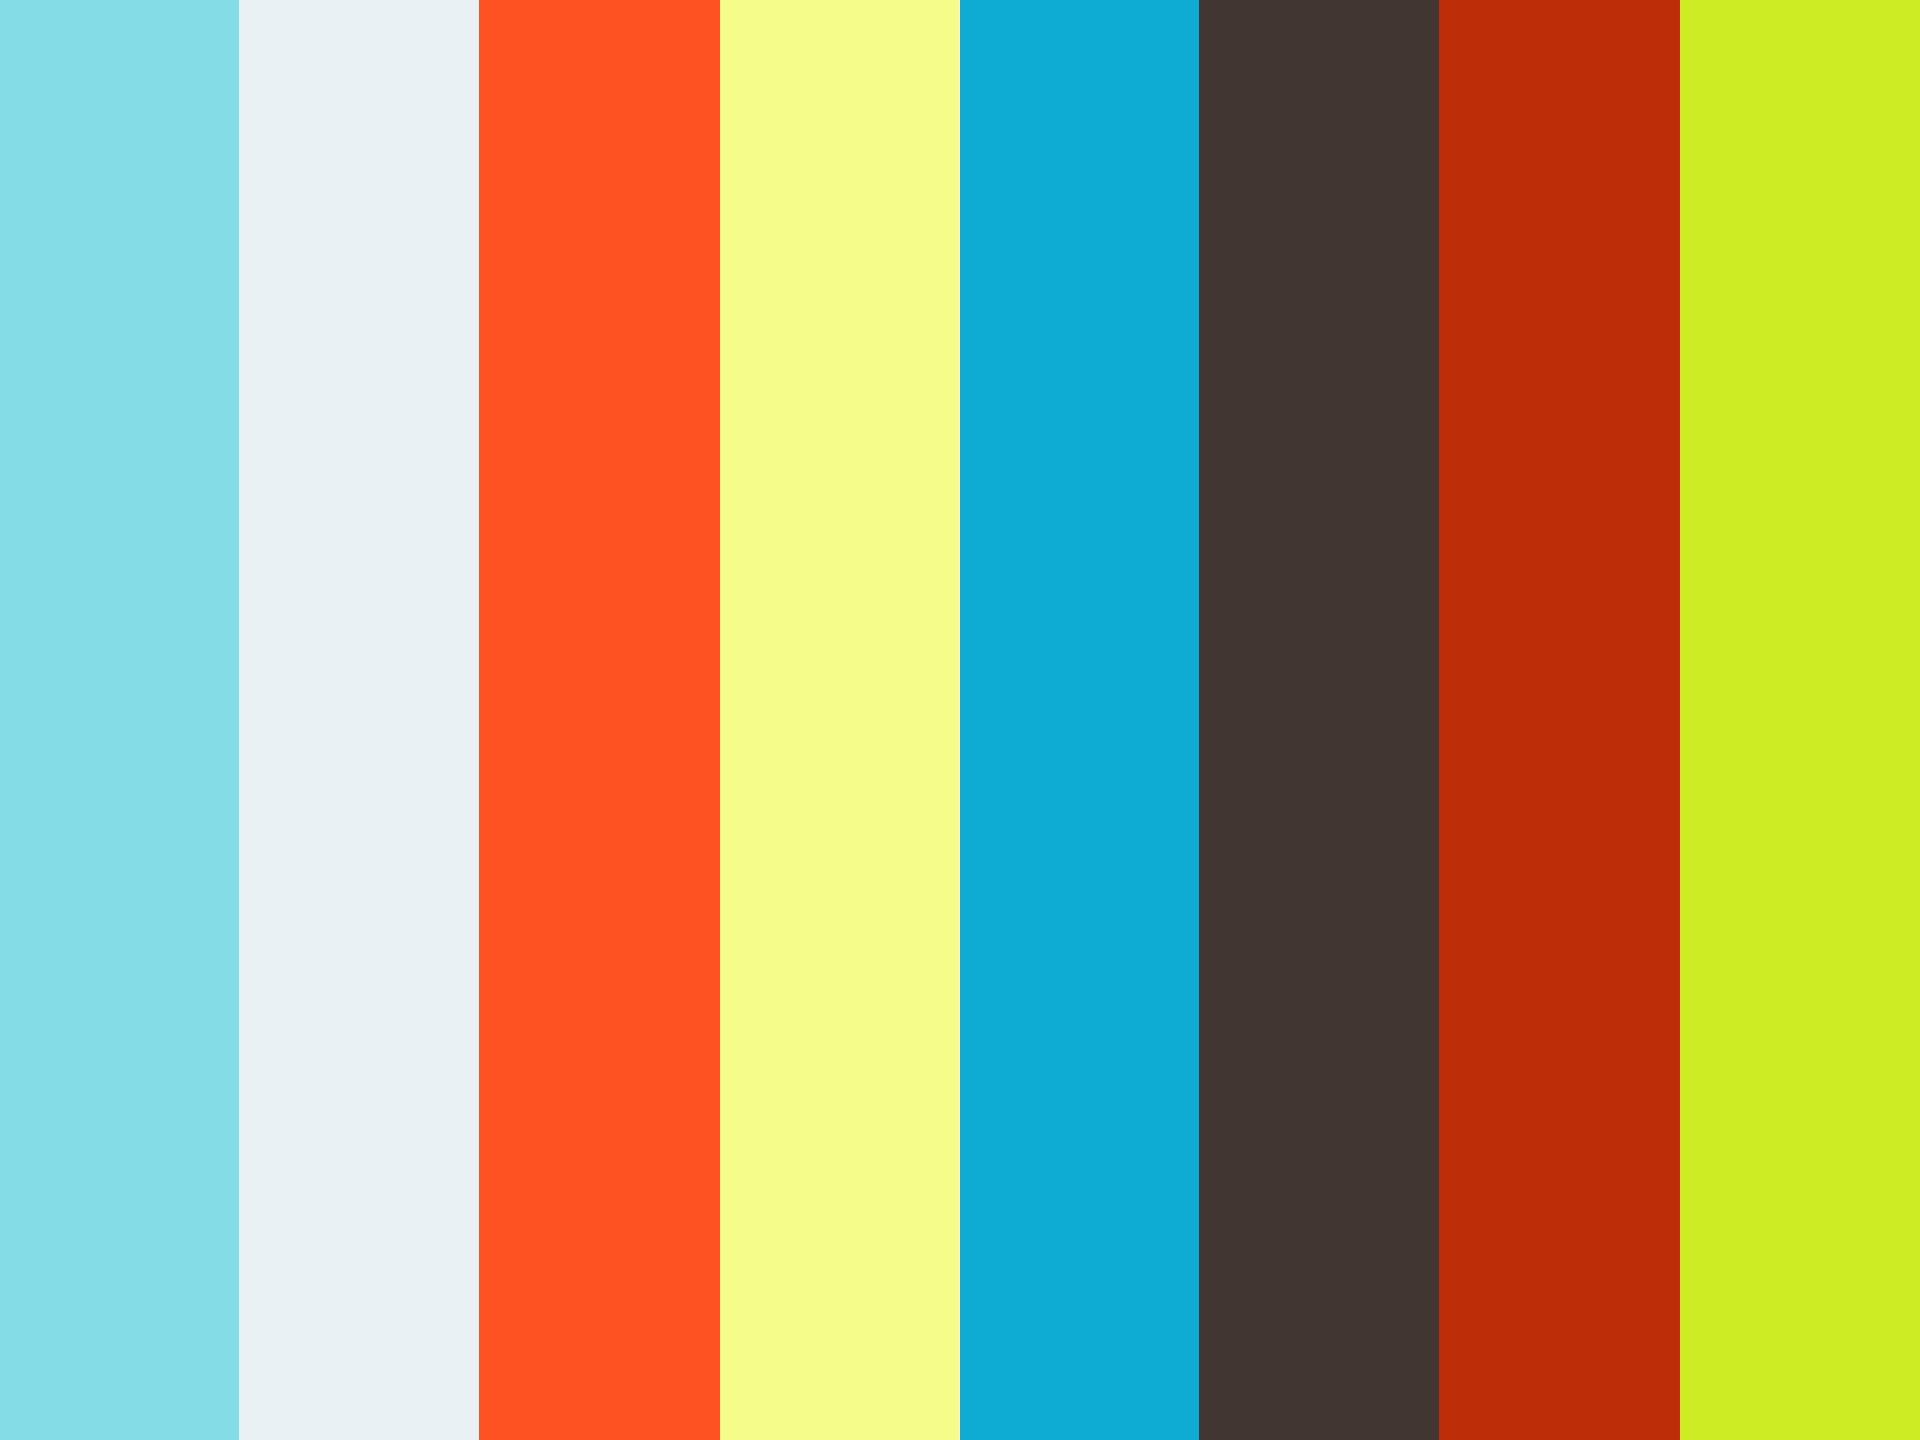 boutique belgique koln homepage animation